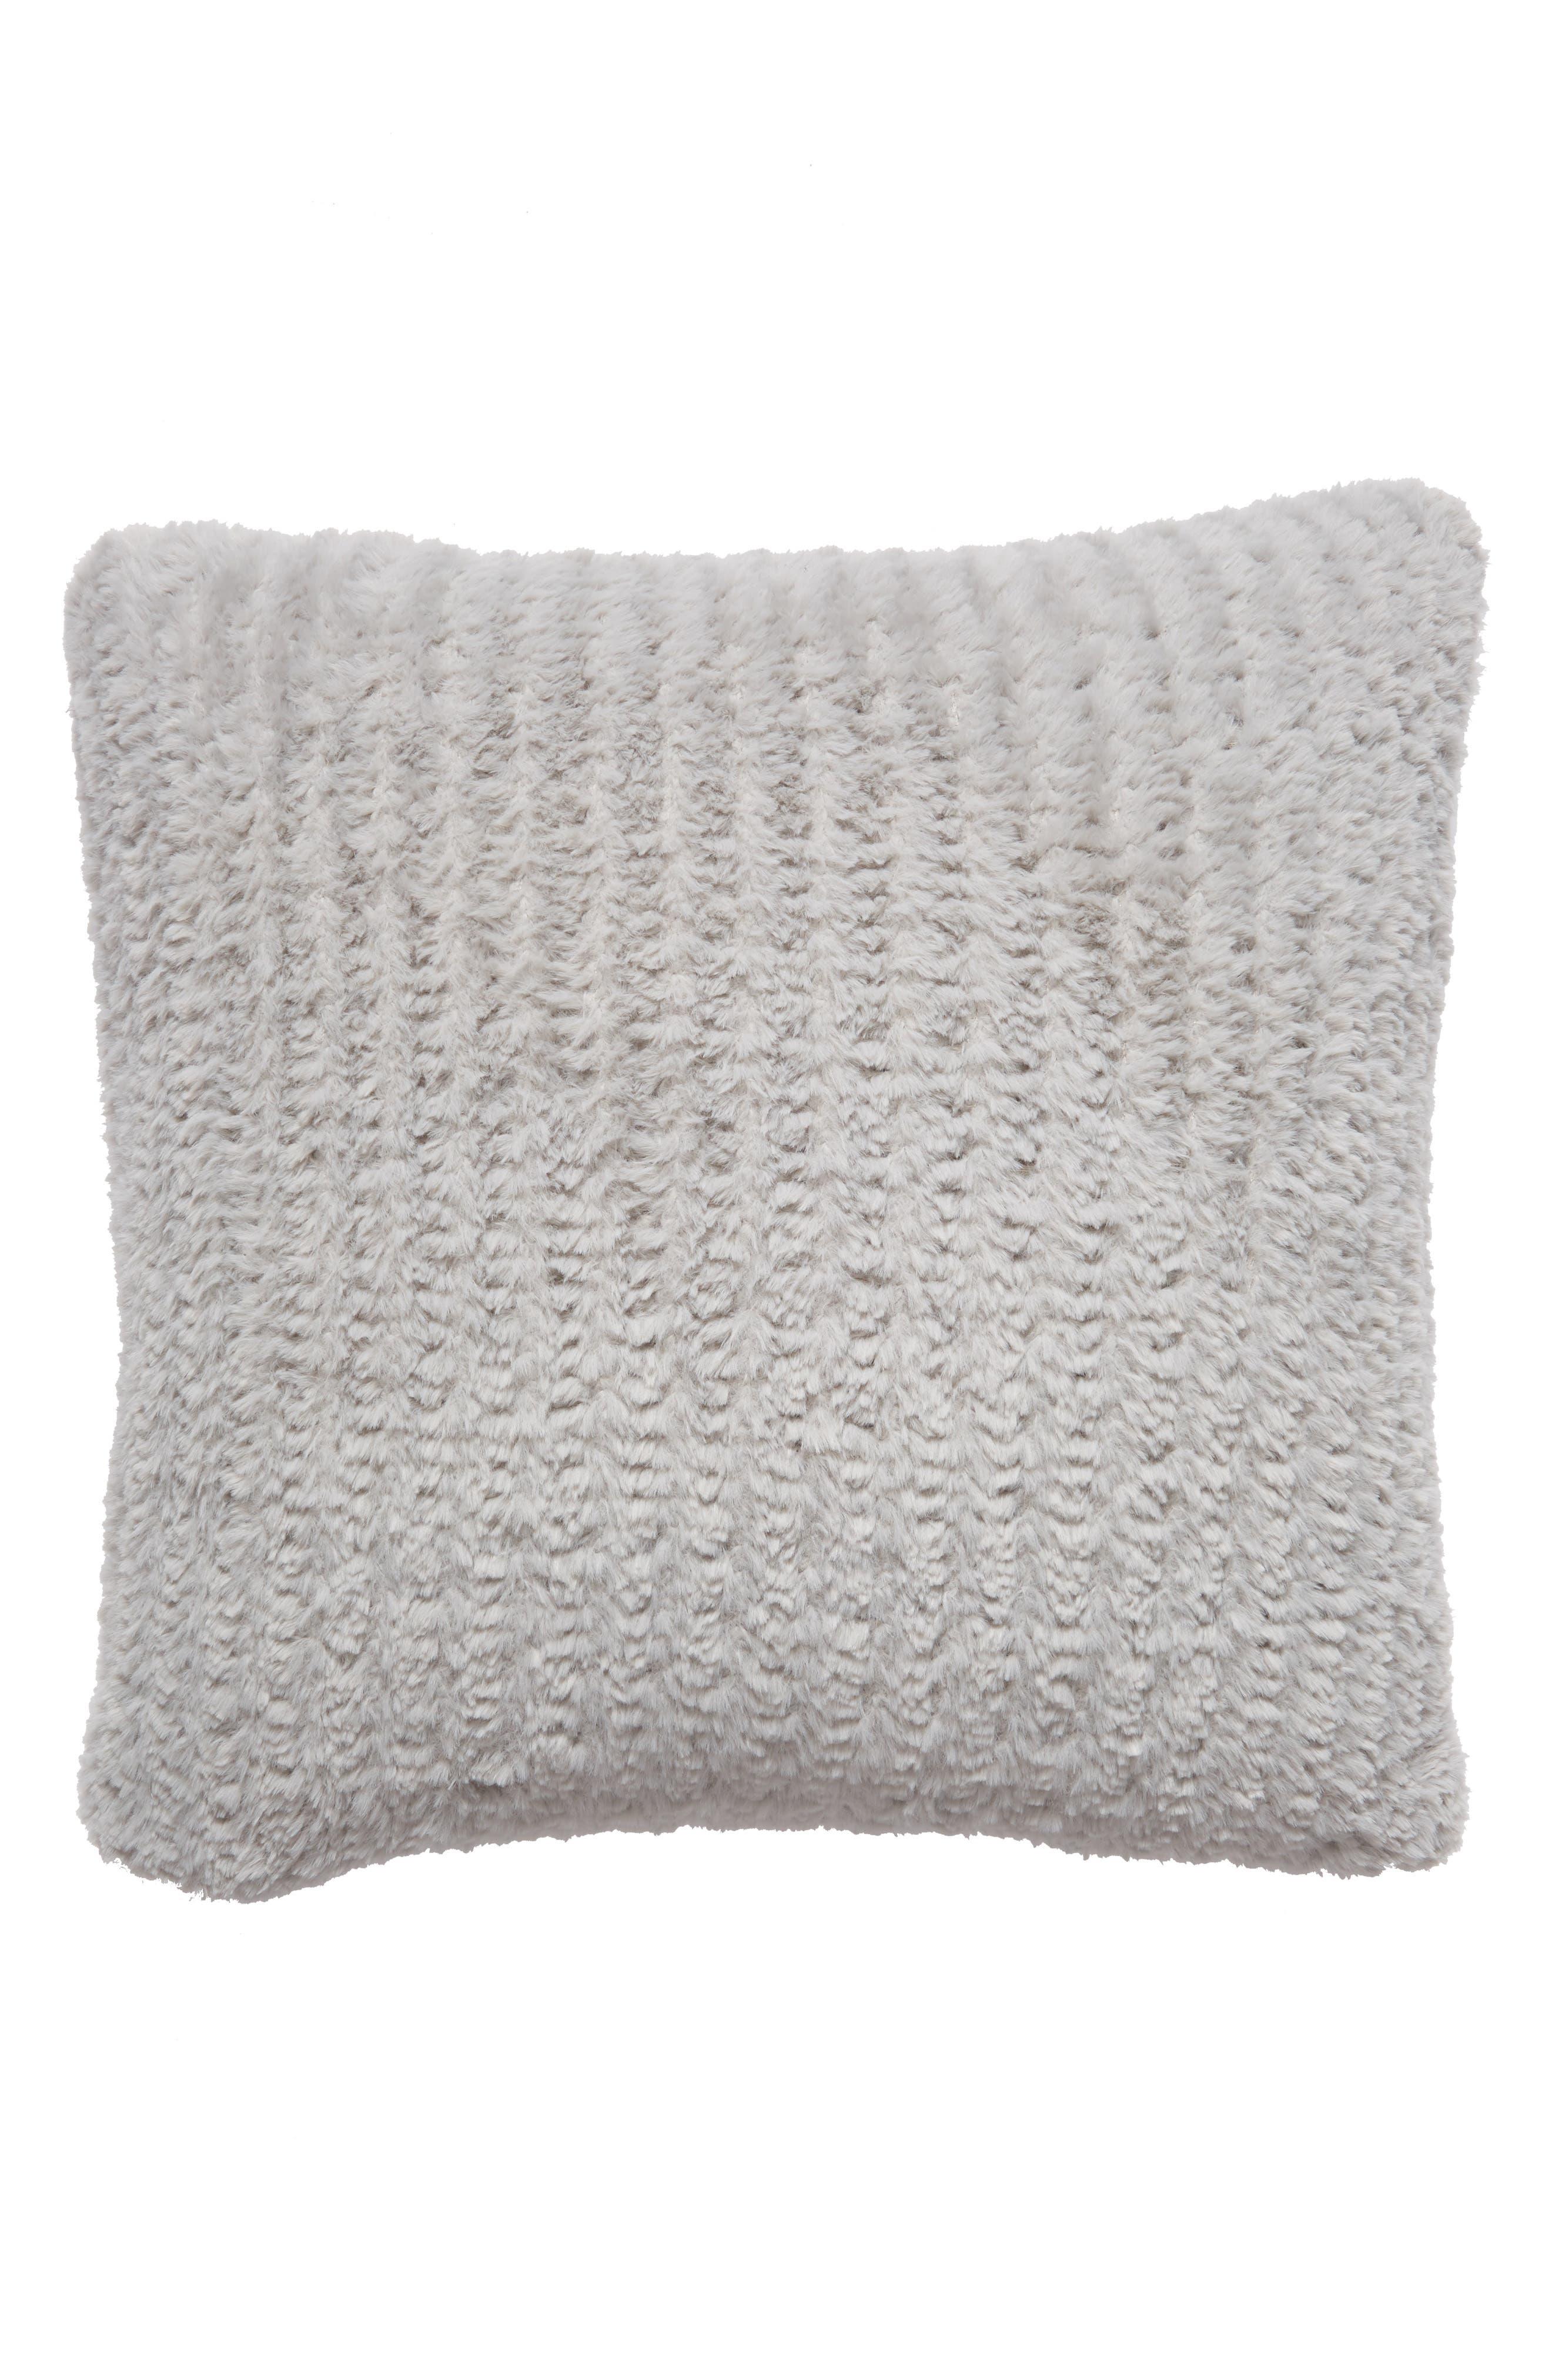 NORDSTROM AT HOME, Lazy Days Faux Fur Accent Pillow, Main thumbnail 1, color, GREY VAPOR